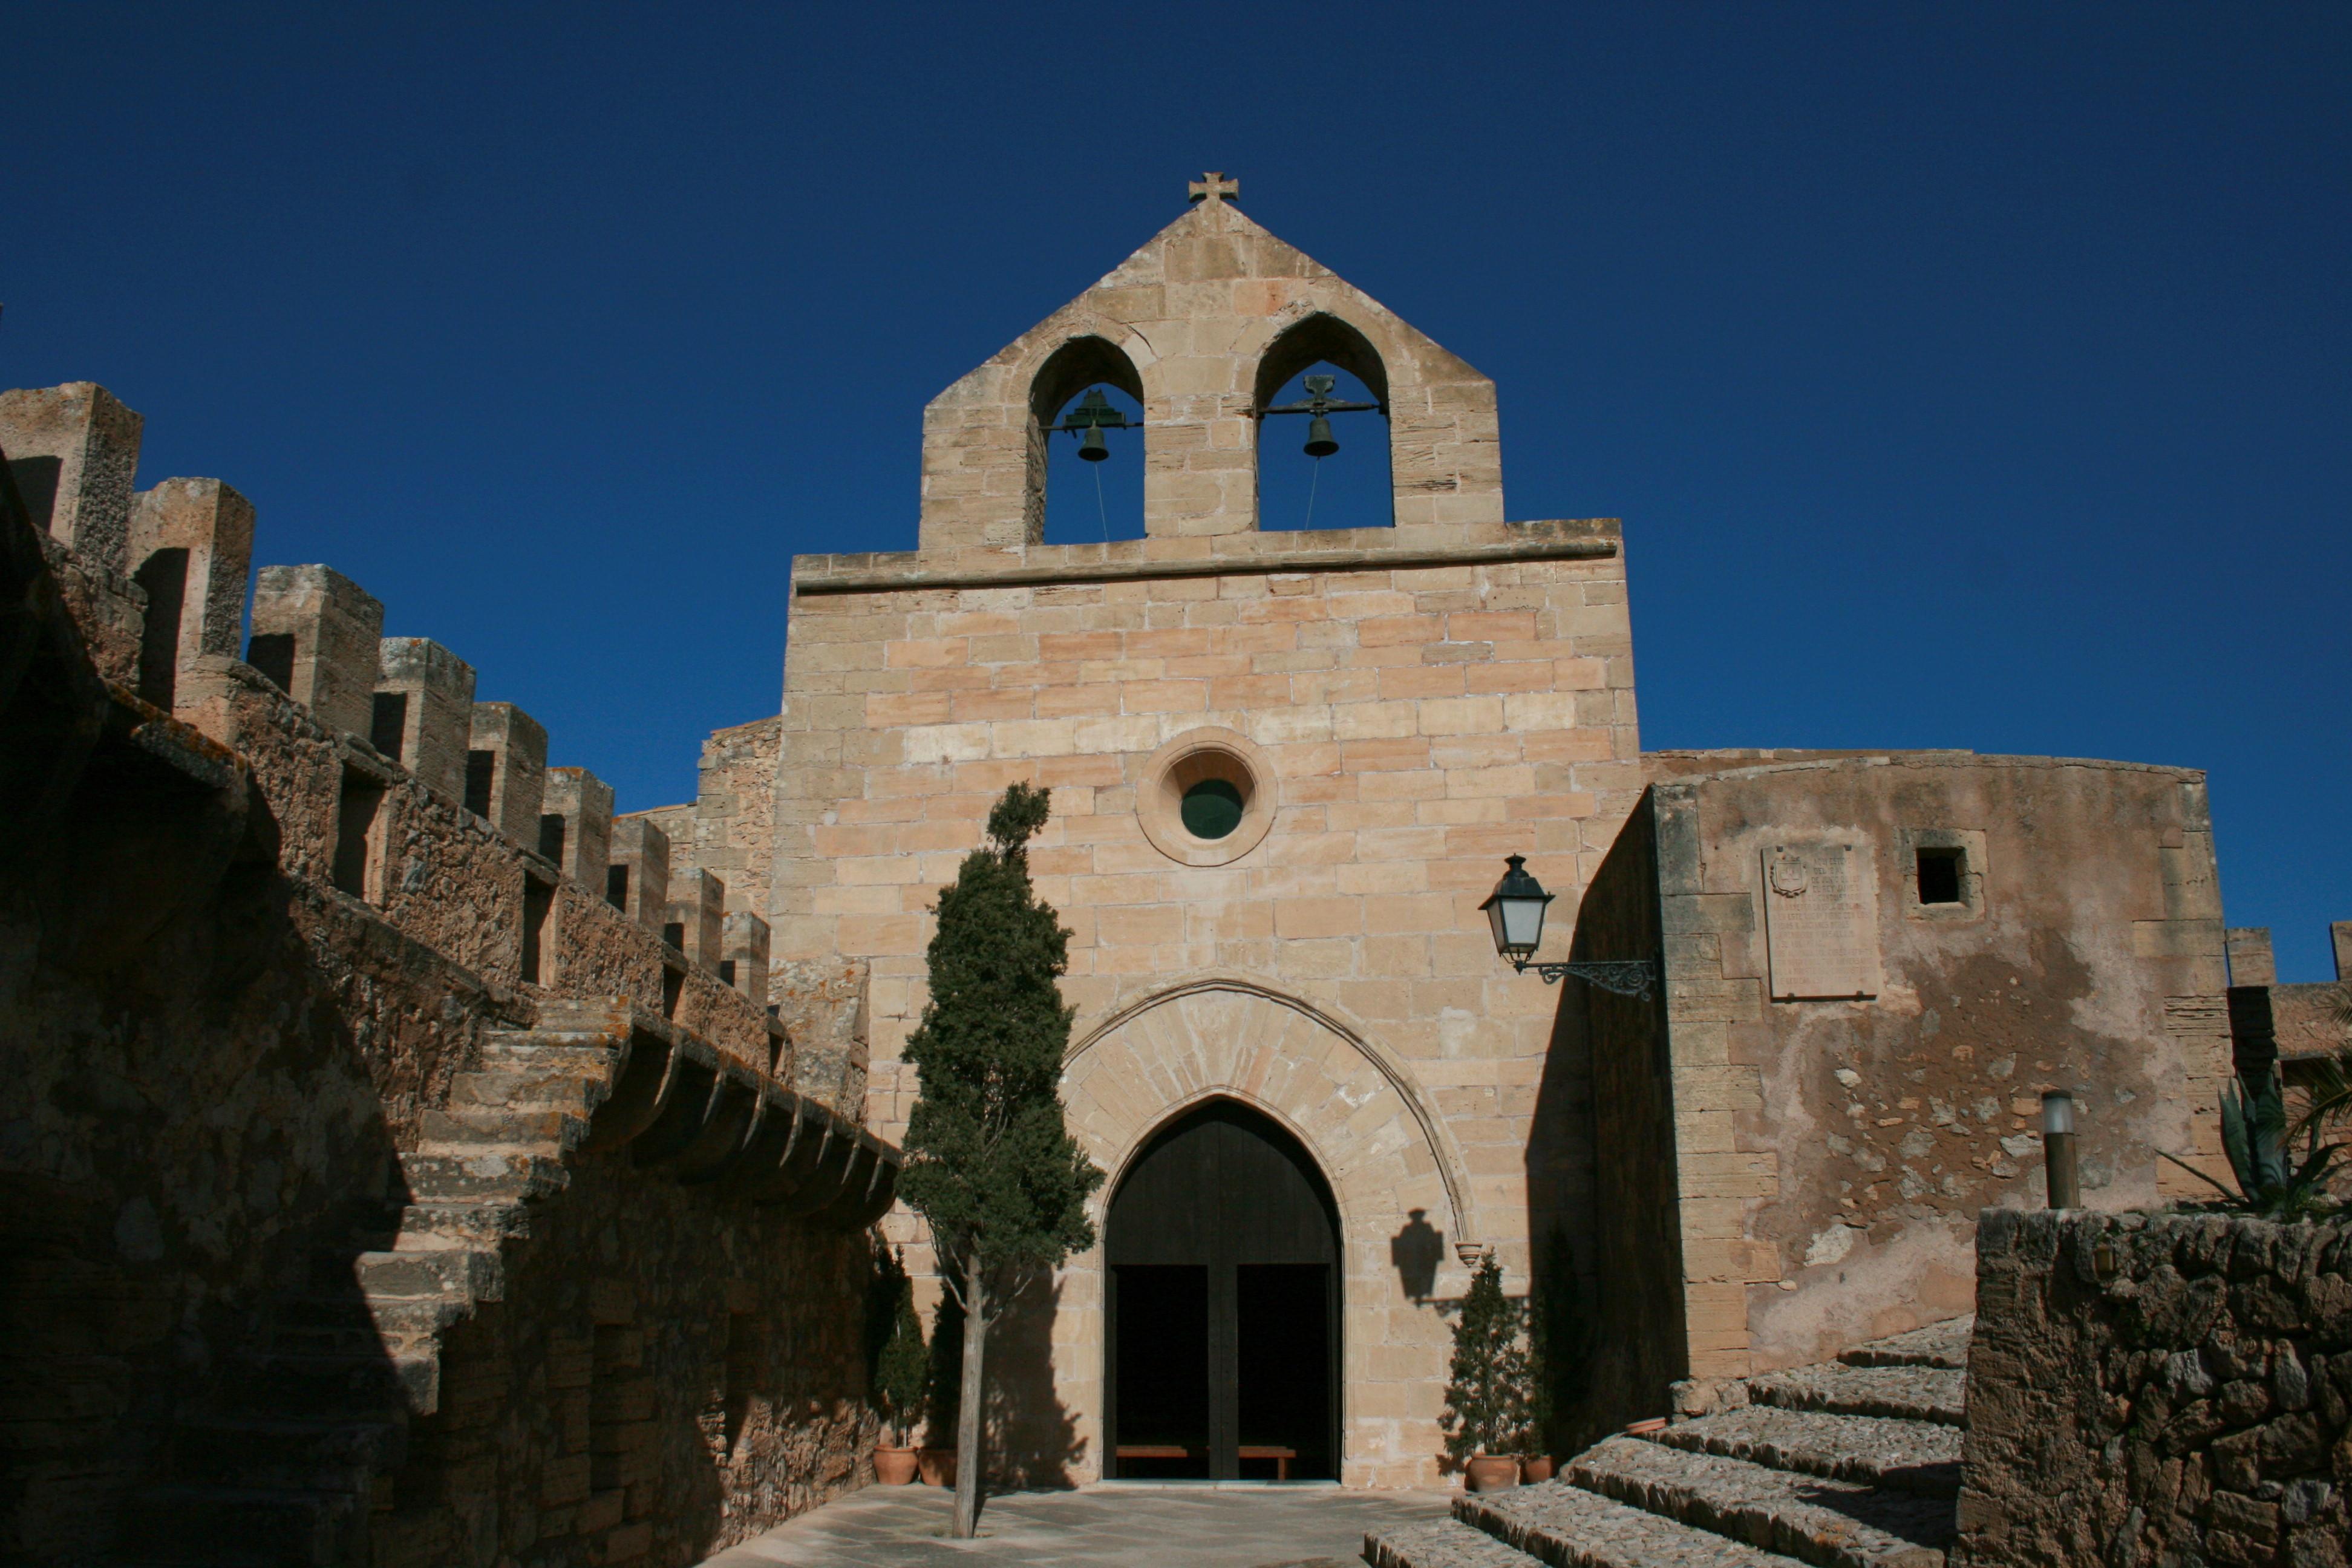 File:Capdepera - Castell de Capdepera - Nuestra Senyora 01 ies.jpg - Wikimedi...